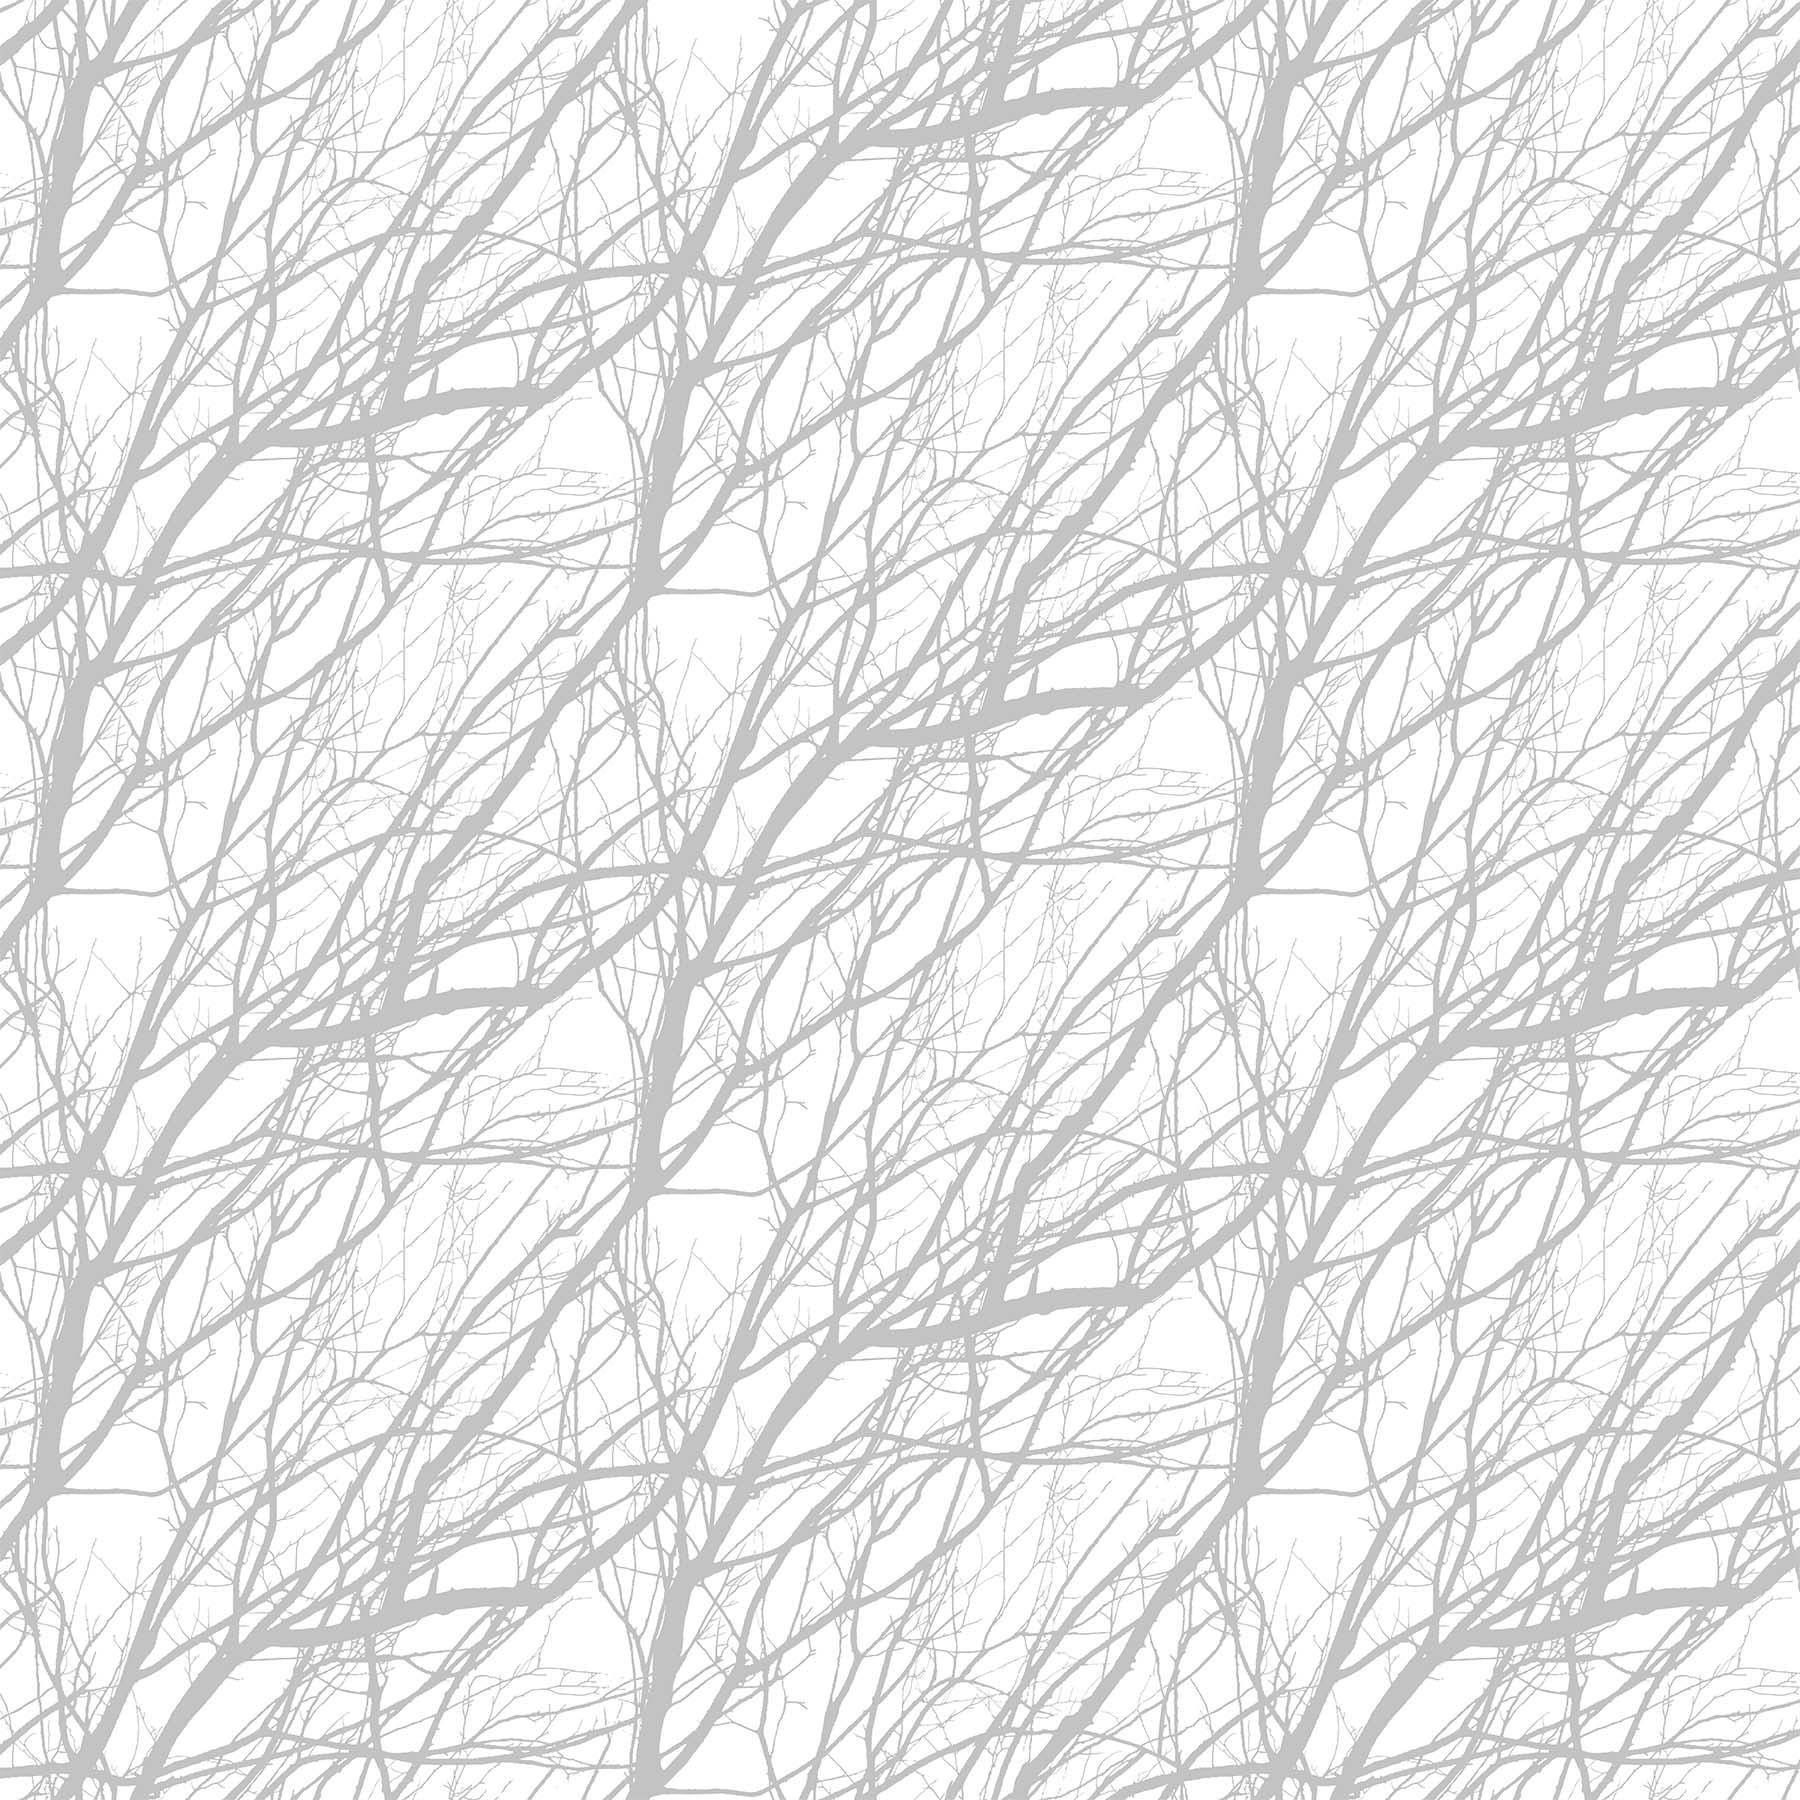 SILHOUETTE GRAY WHITE